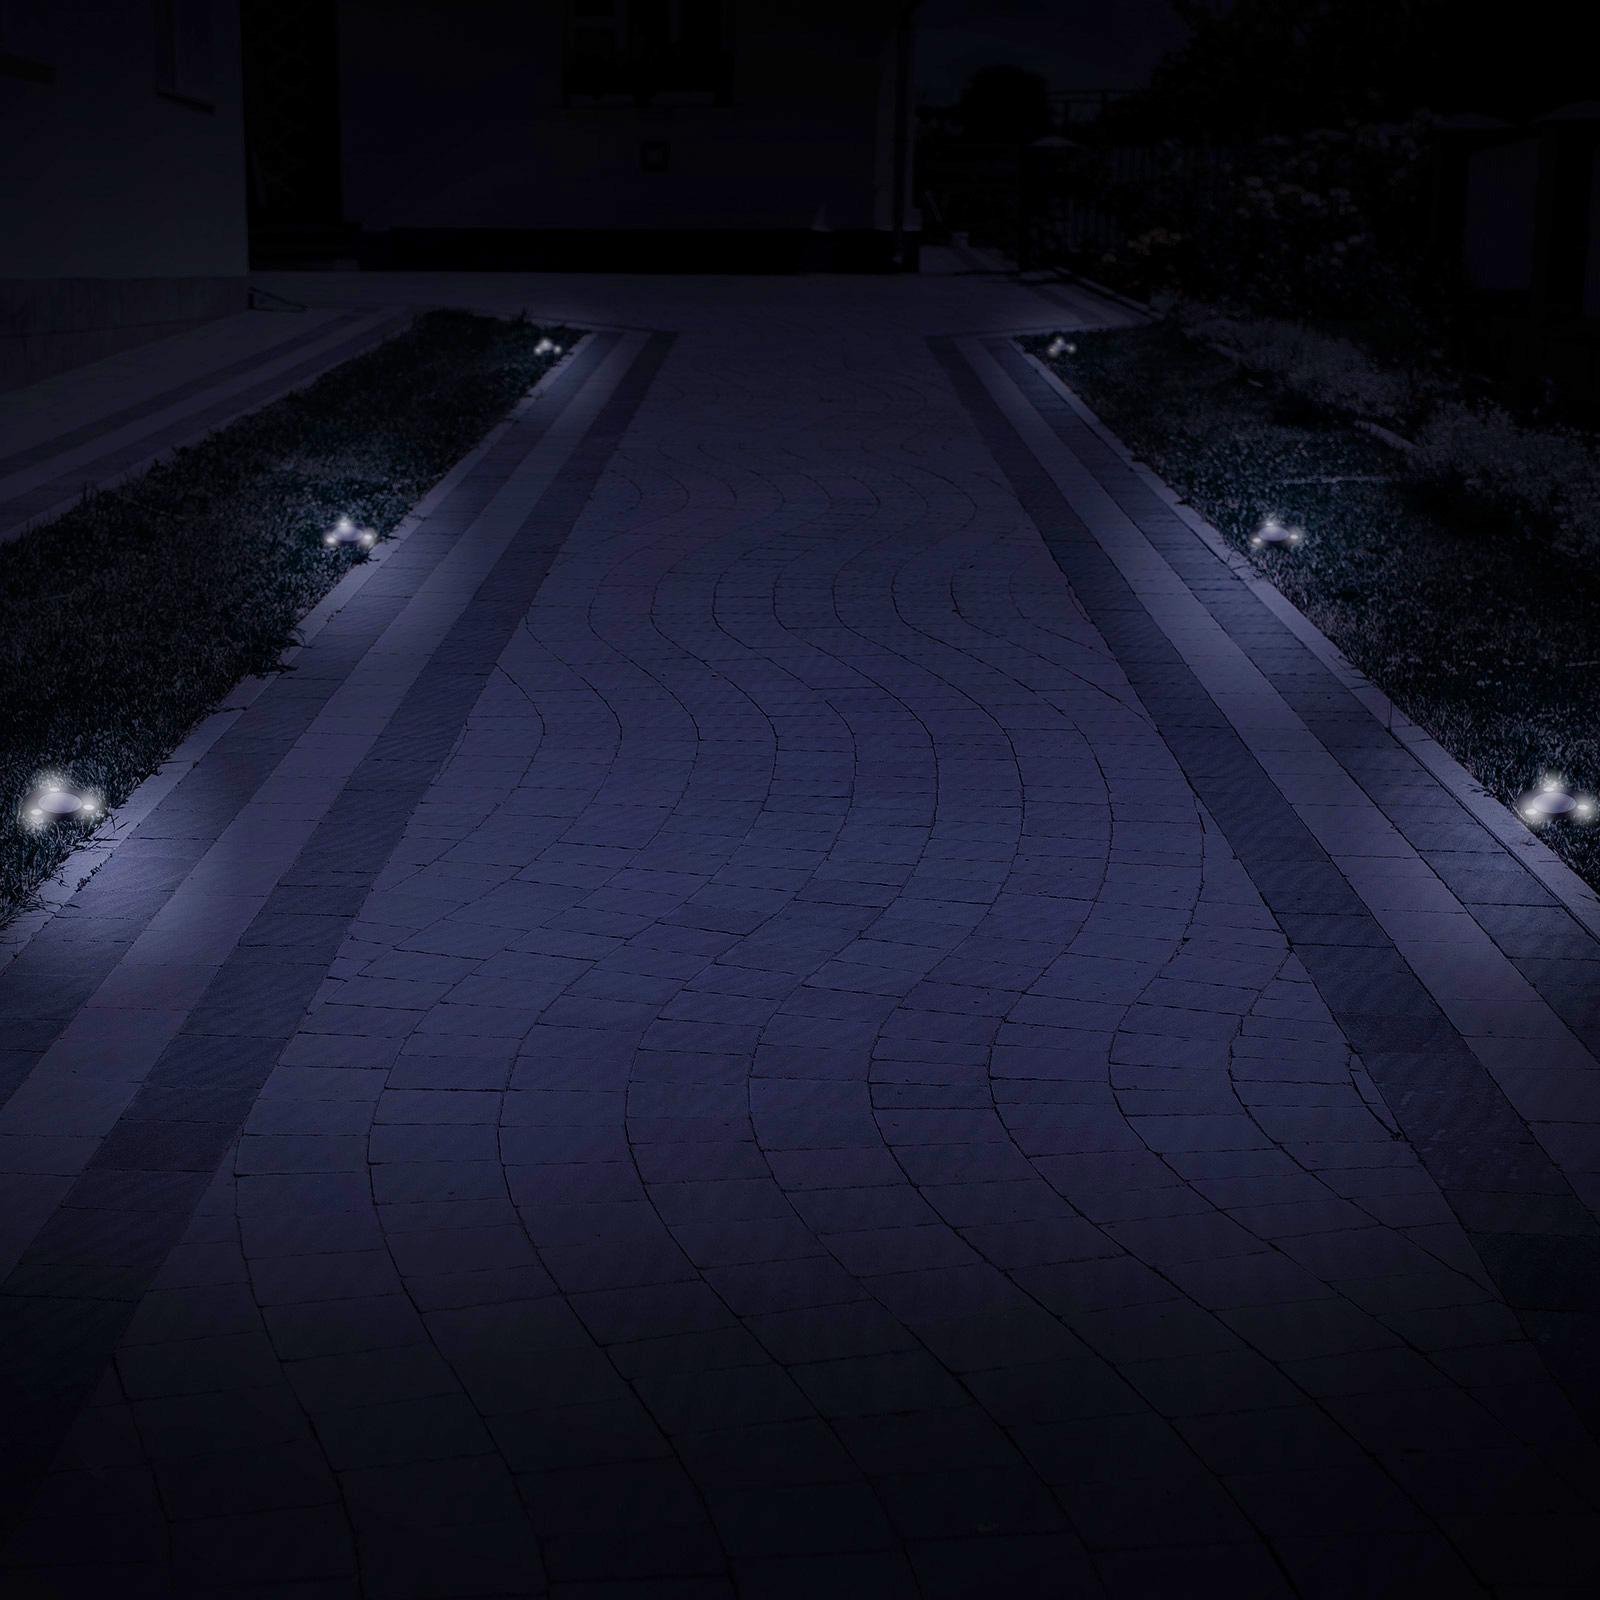 Driveway Solar Lights For Sale: GreenLighting Solar Flat In-Ground Driveway Light Set 8